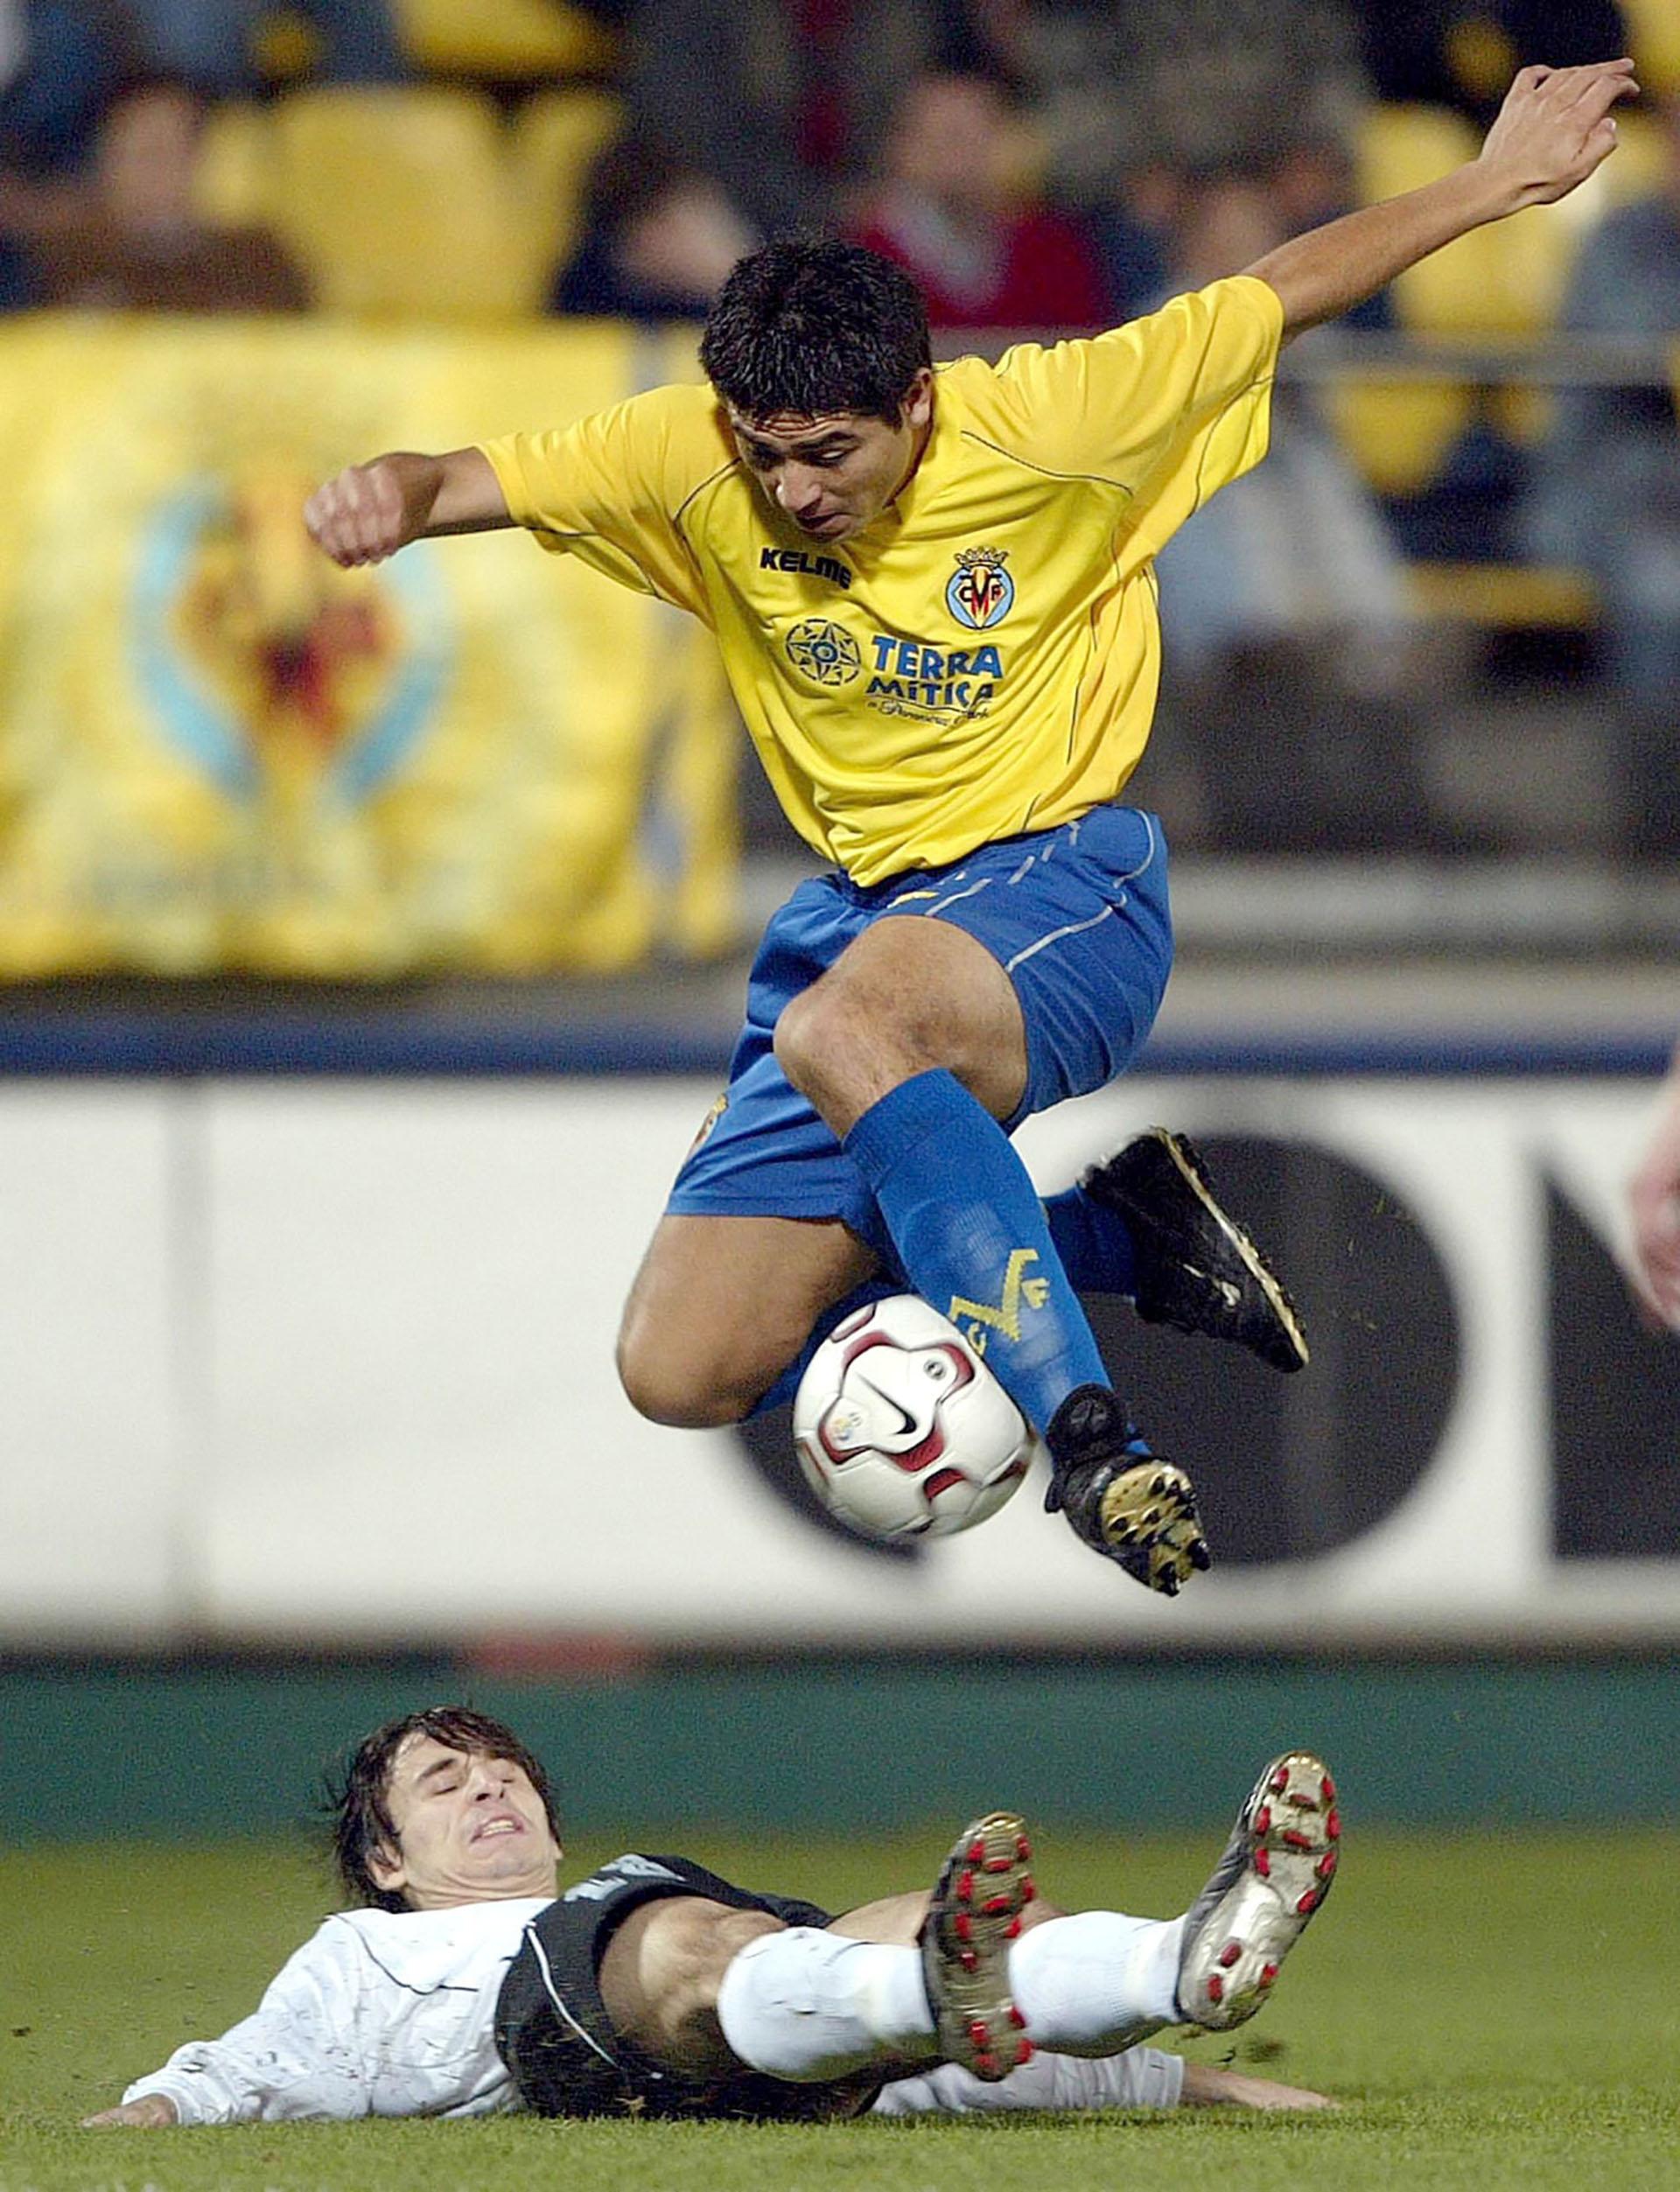 Jugó en Villarreal entre 2003 y 2006 (NA)